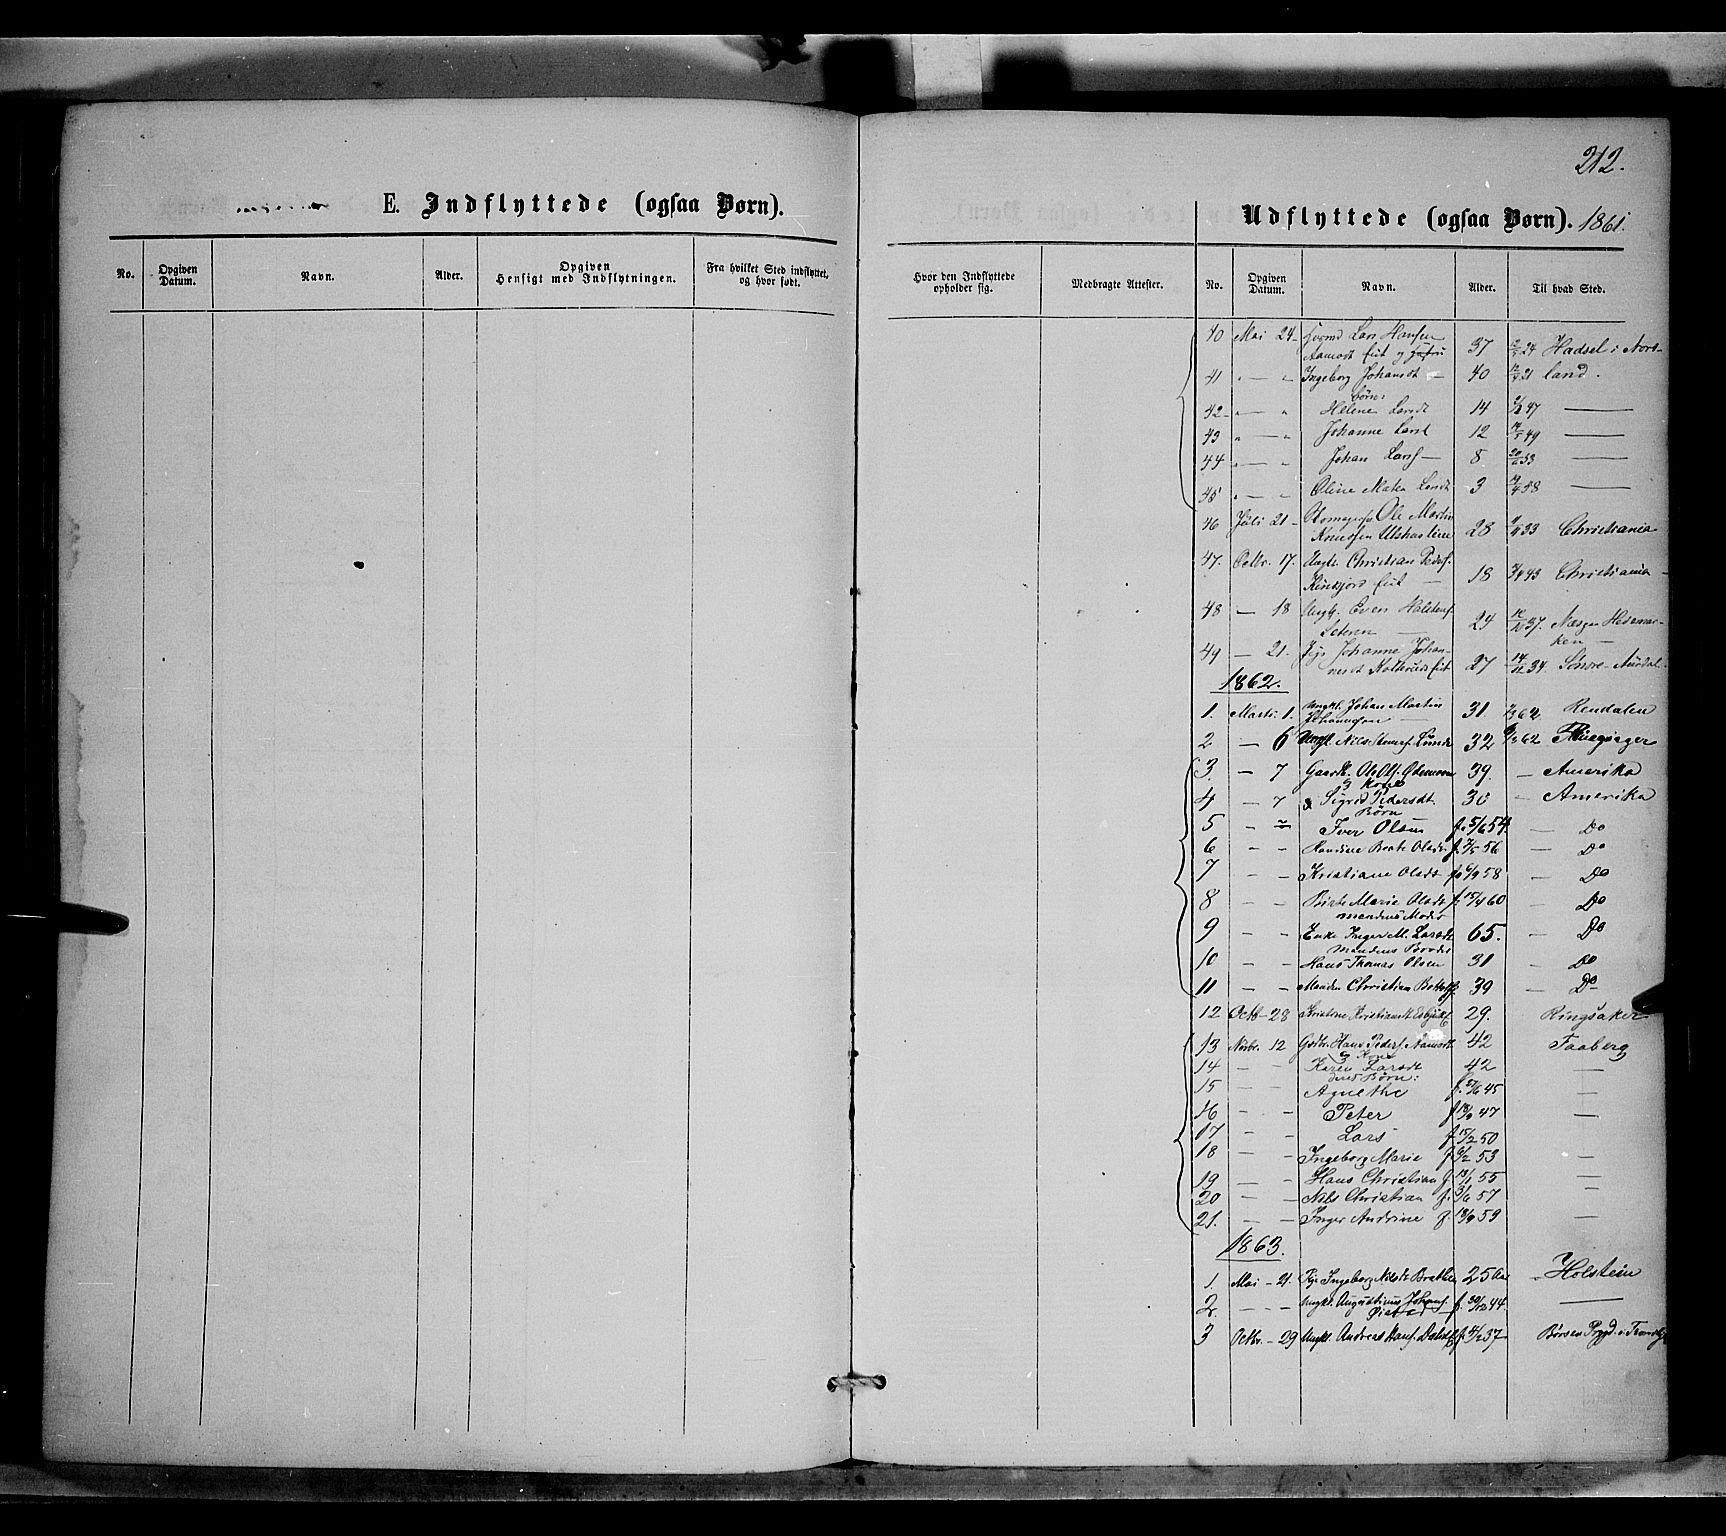 SAH, Nordre Land prestekontor, Ministerialbok nr. 1, 1860-1871, s. 212